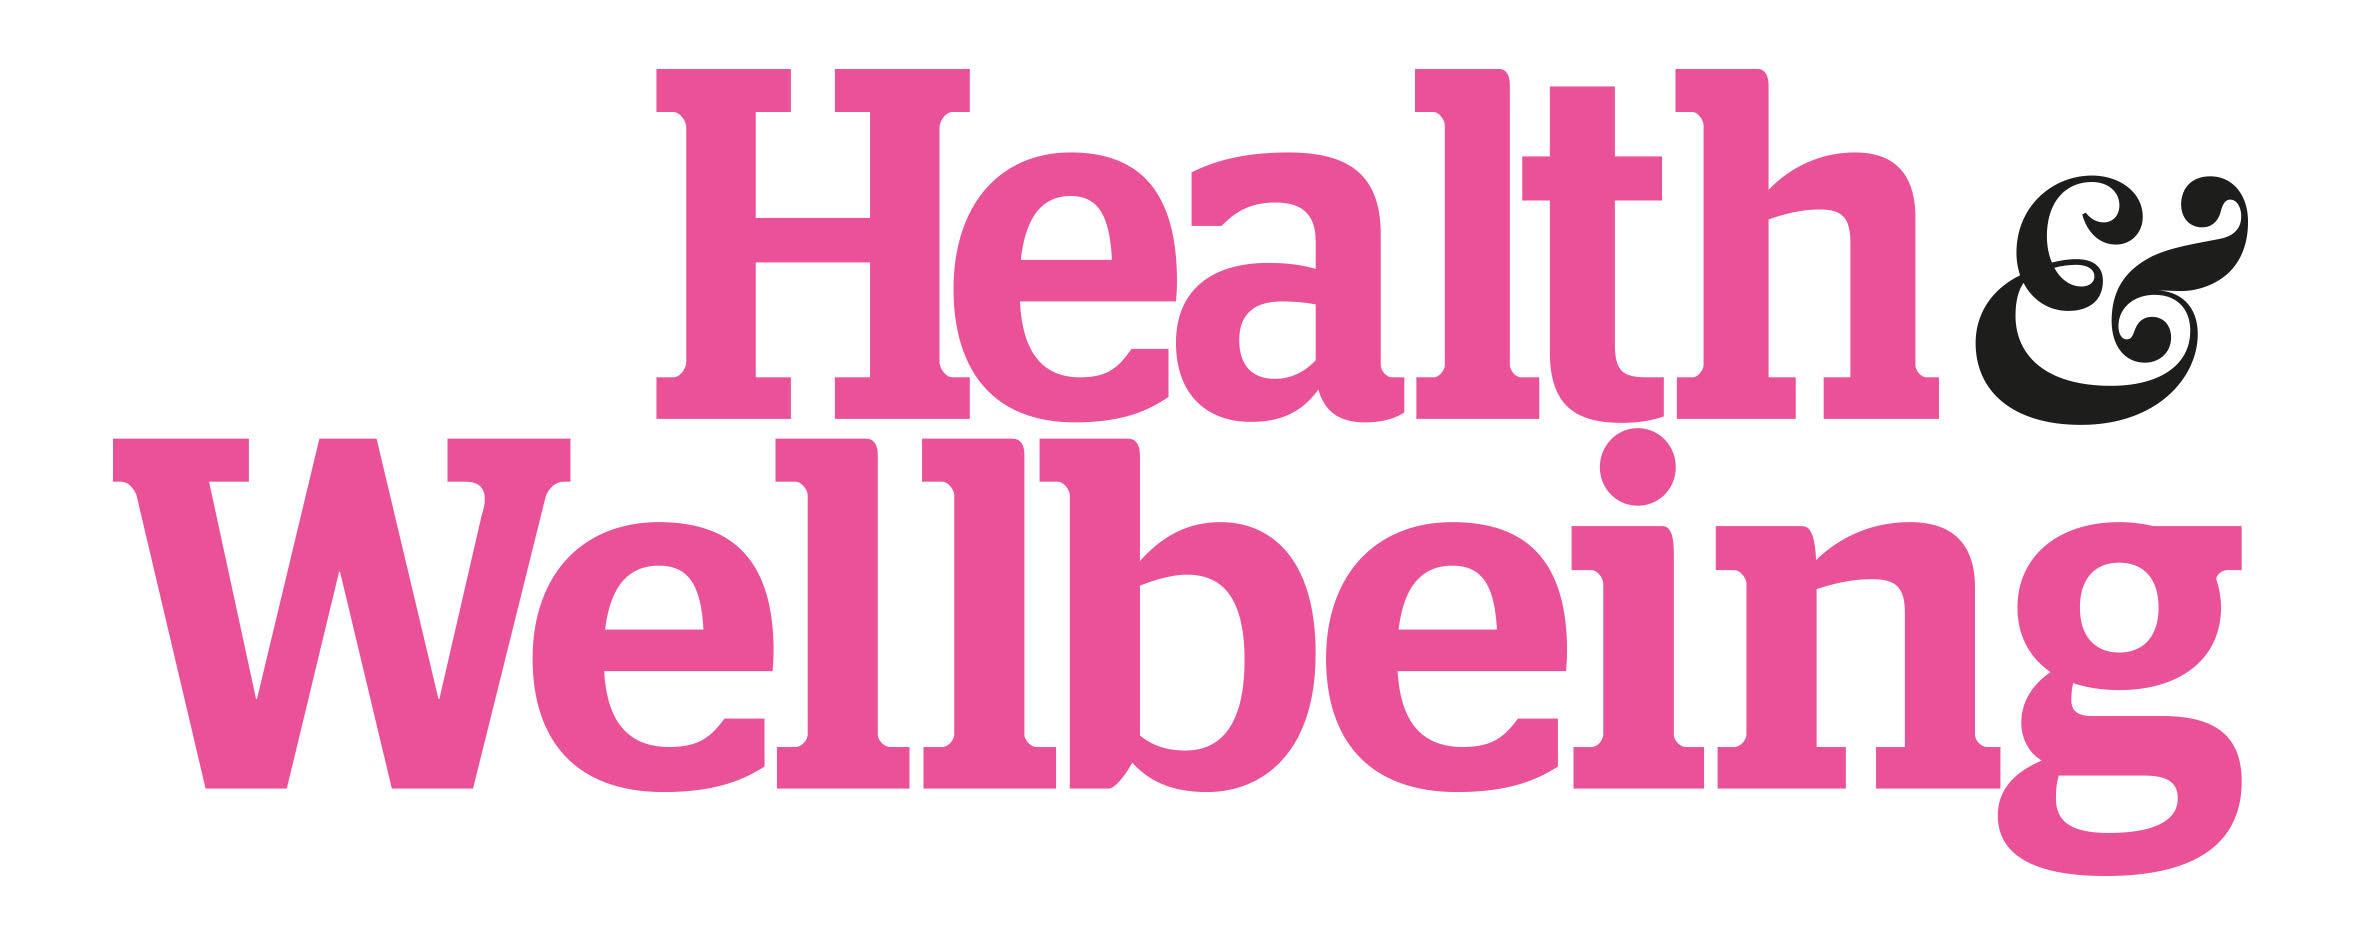 Health & Wellbeing.jpg